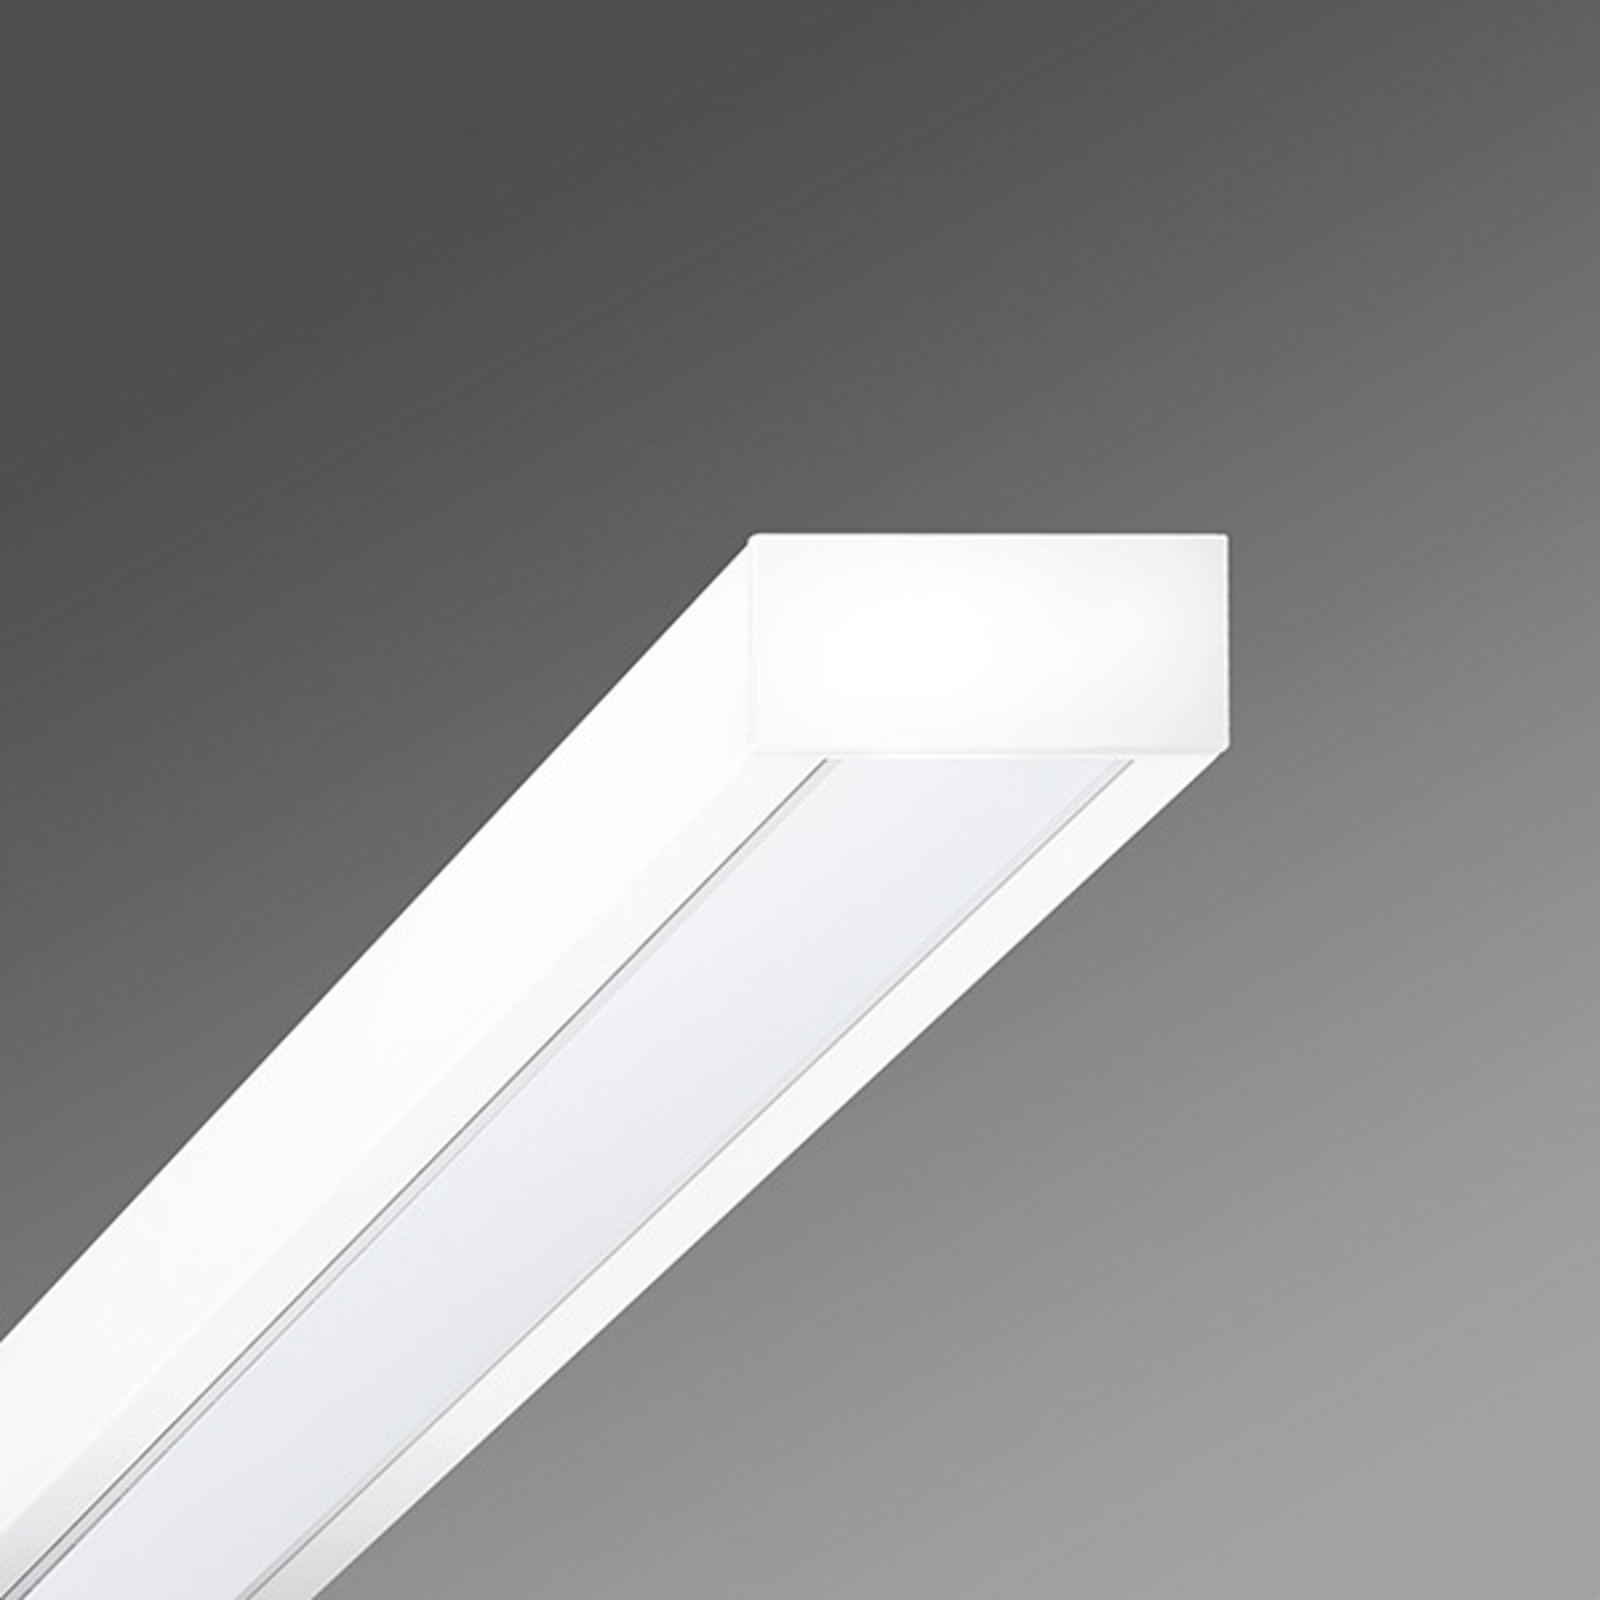 LED plafondlamp cubus-RSAGC-1500 3191lm diffusor